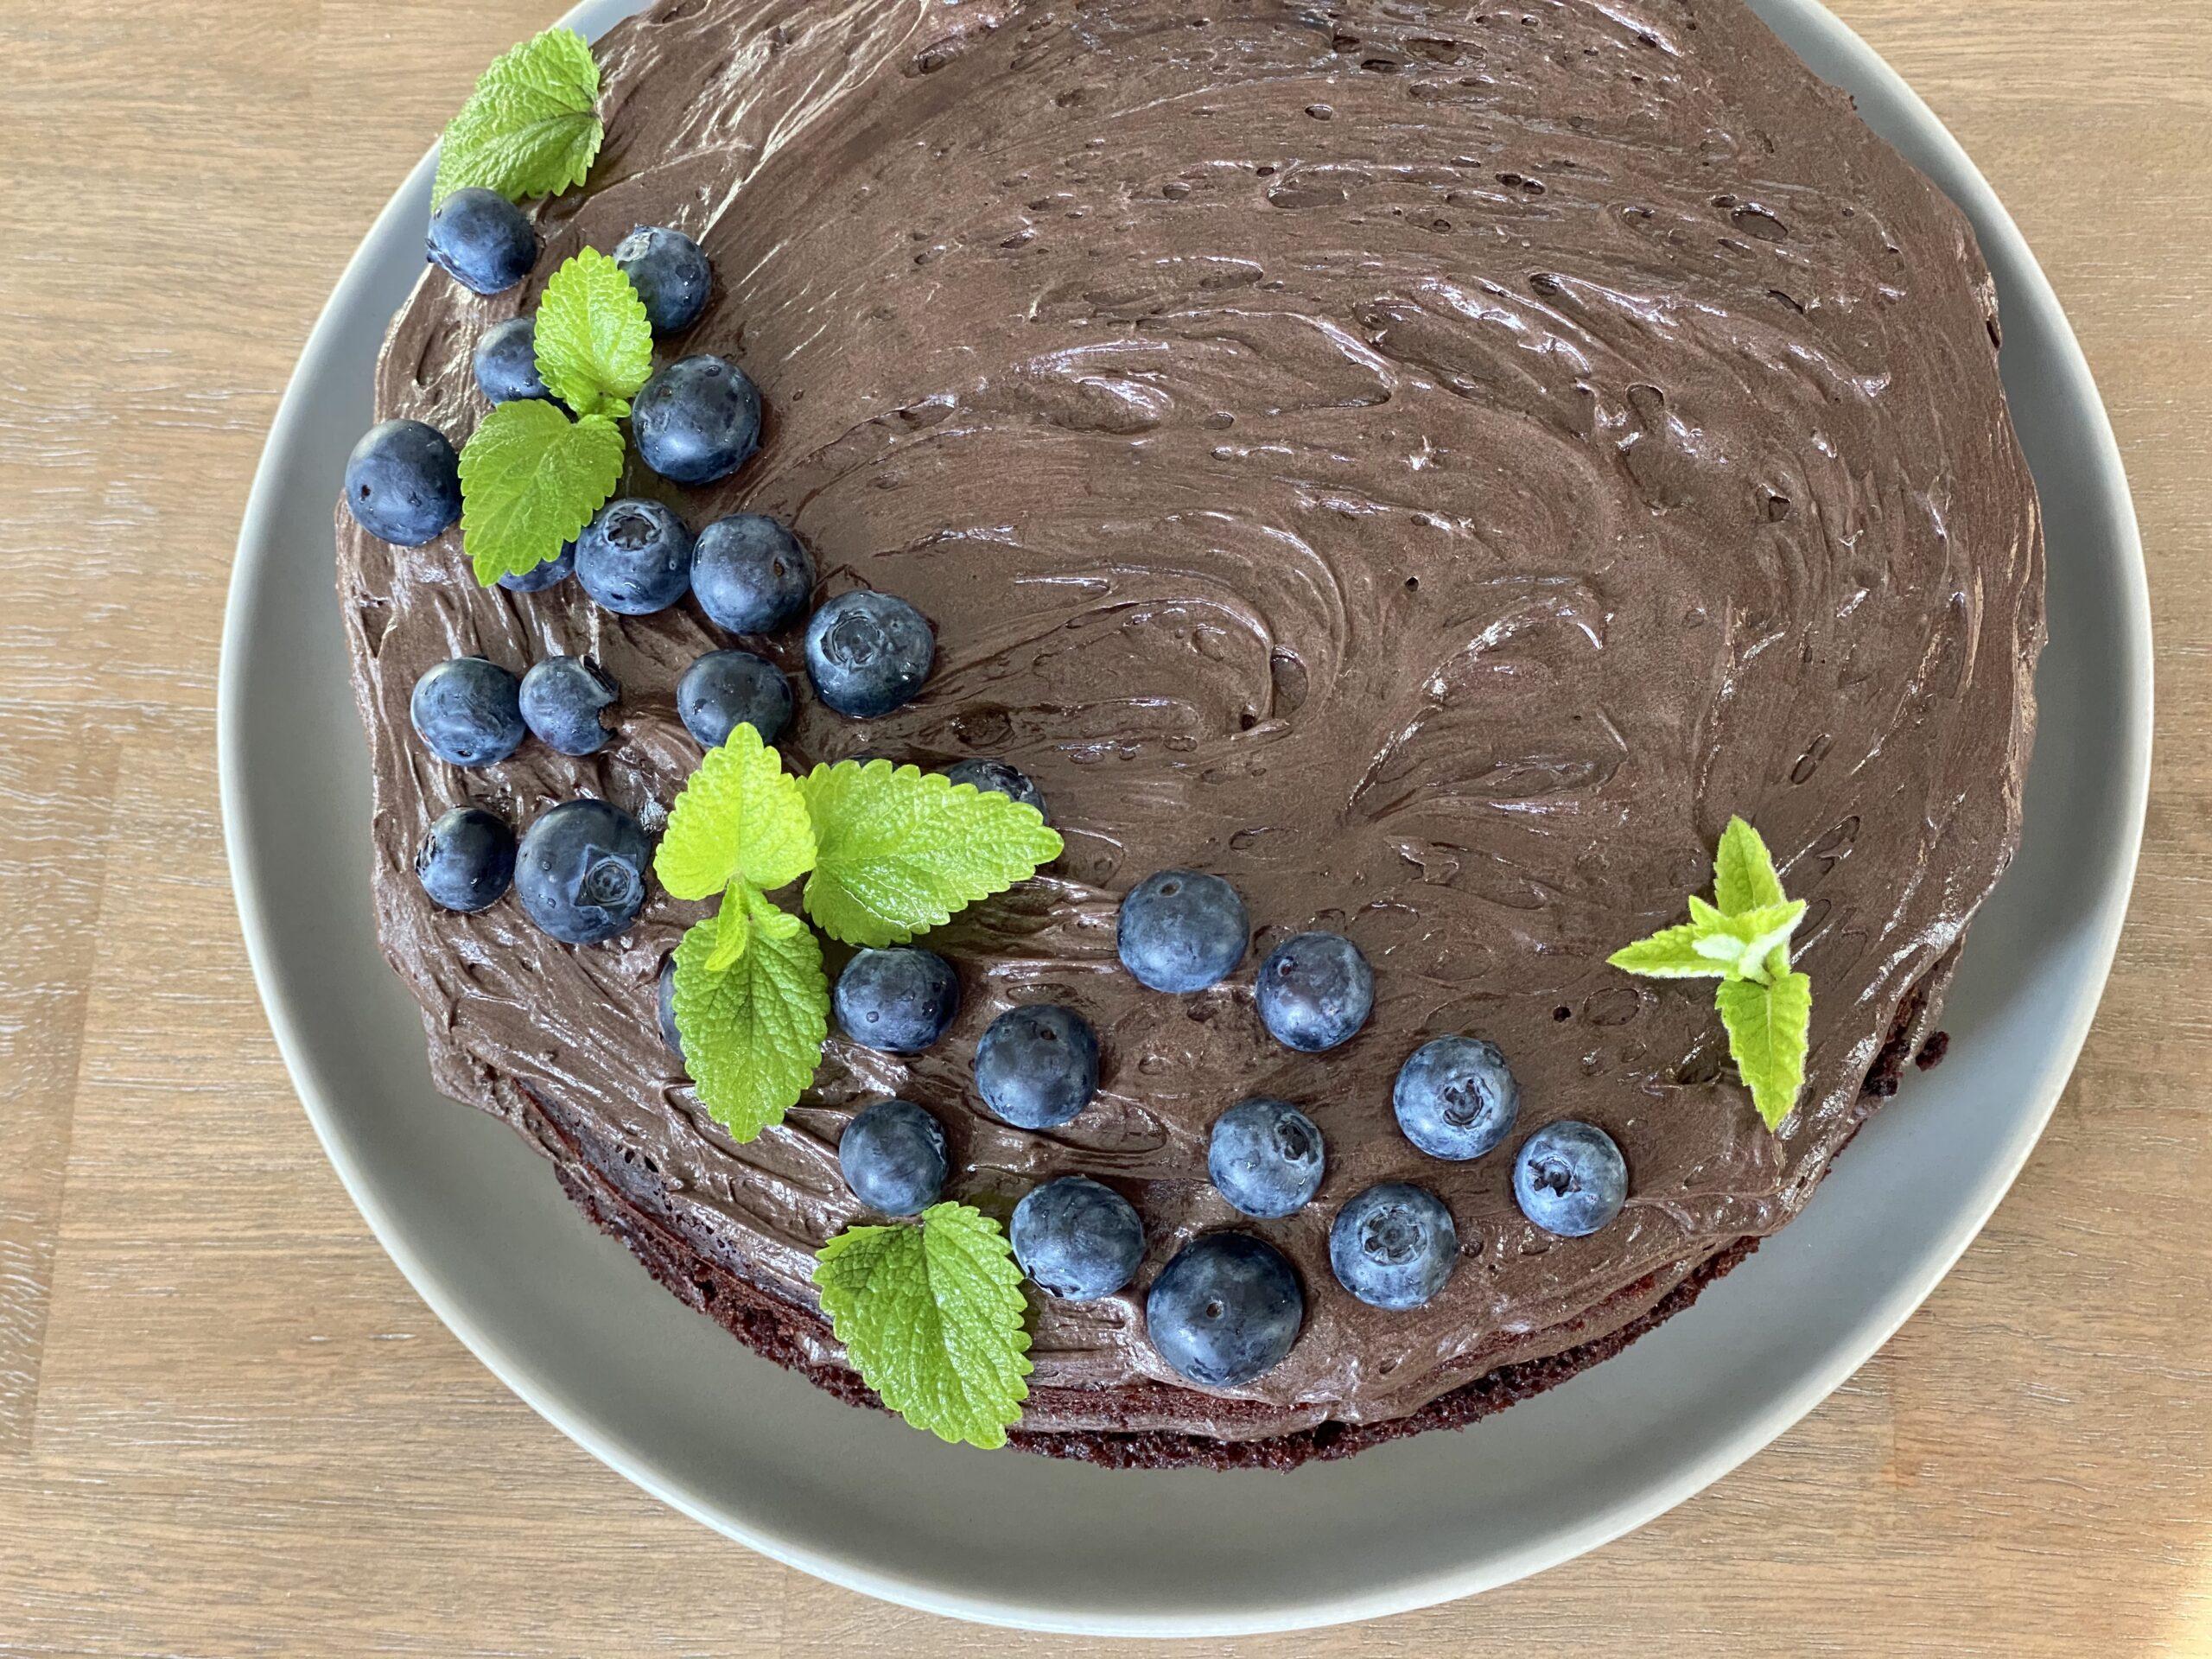 Decadent Chocolate Cake with Dark Rum Chocolate Frosting (vegan and gluten free!)